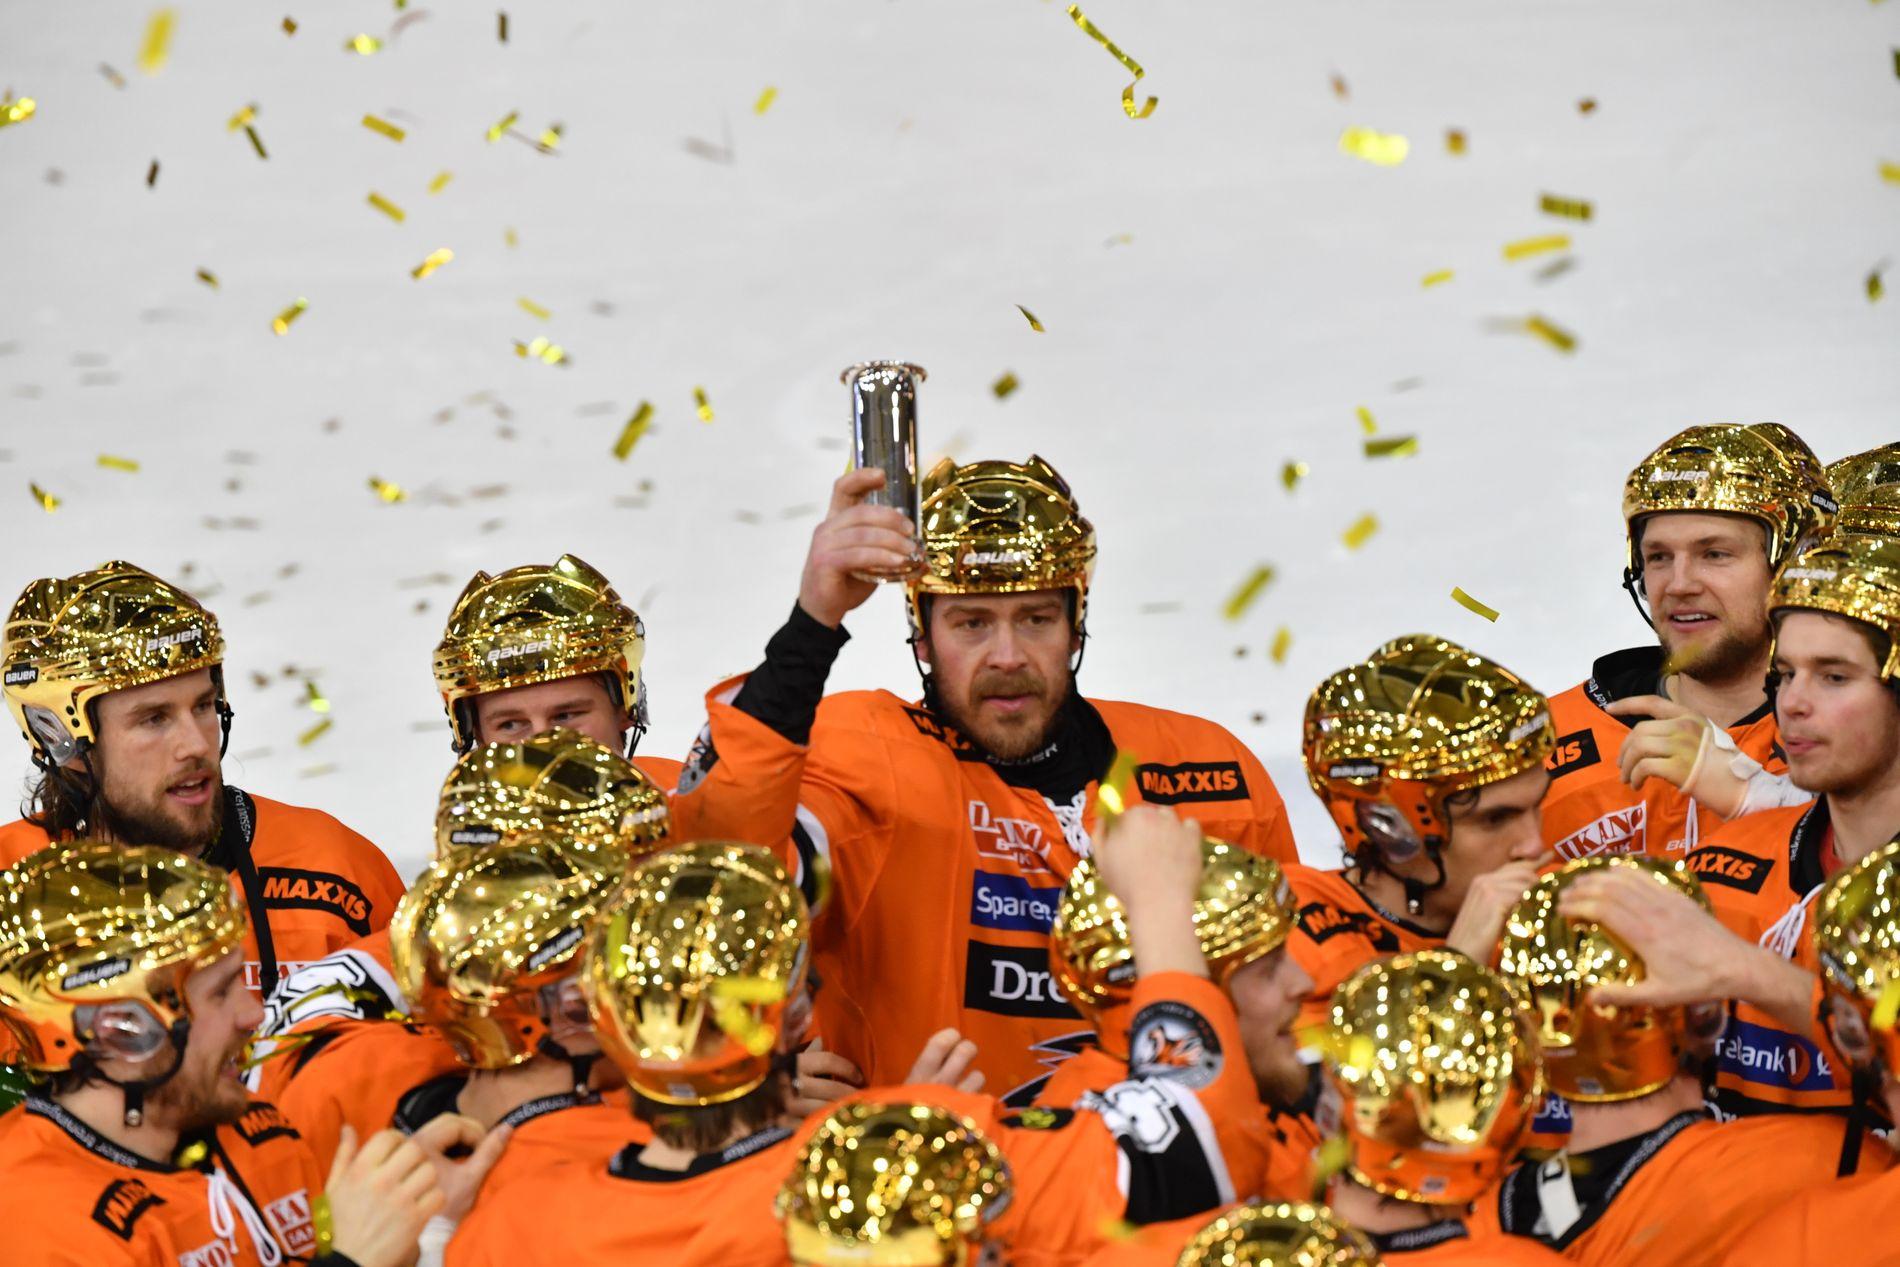 NORSK MESTER: Lagkaptein Anders Bastiansen og hans Frisk Asker kunne heve kongepokalen etter finaleseieren over Storhamar i NM-sluttspillet for et par måneder siden.